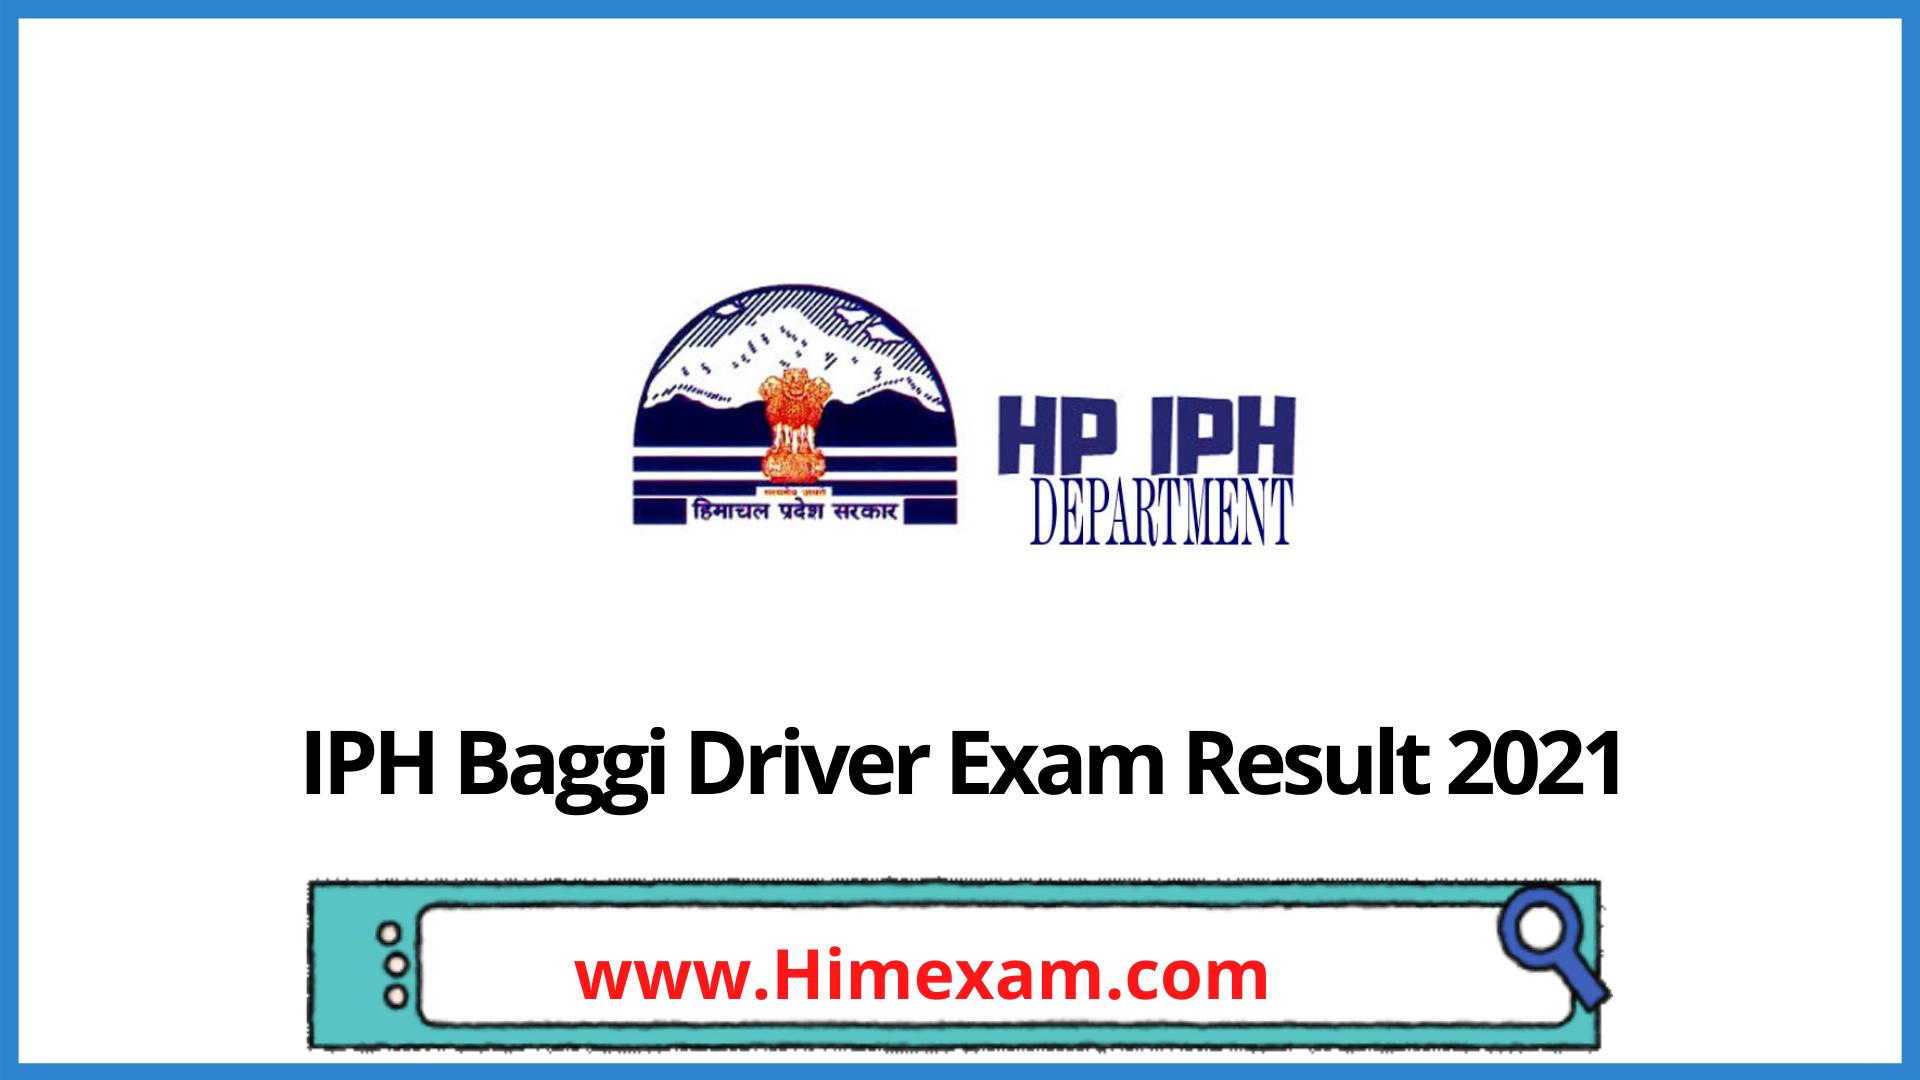 IPH Baggi Driver Exam Result 2021